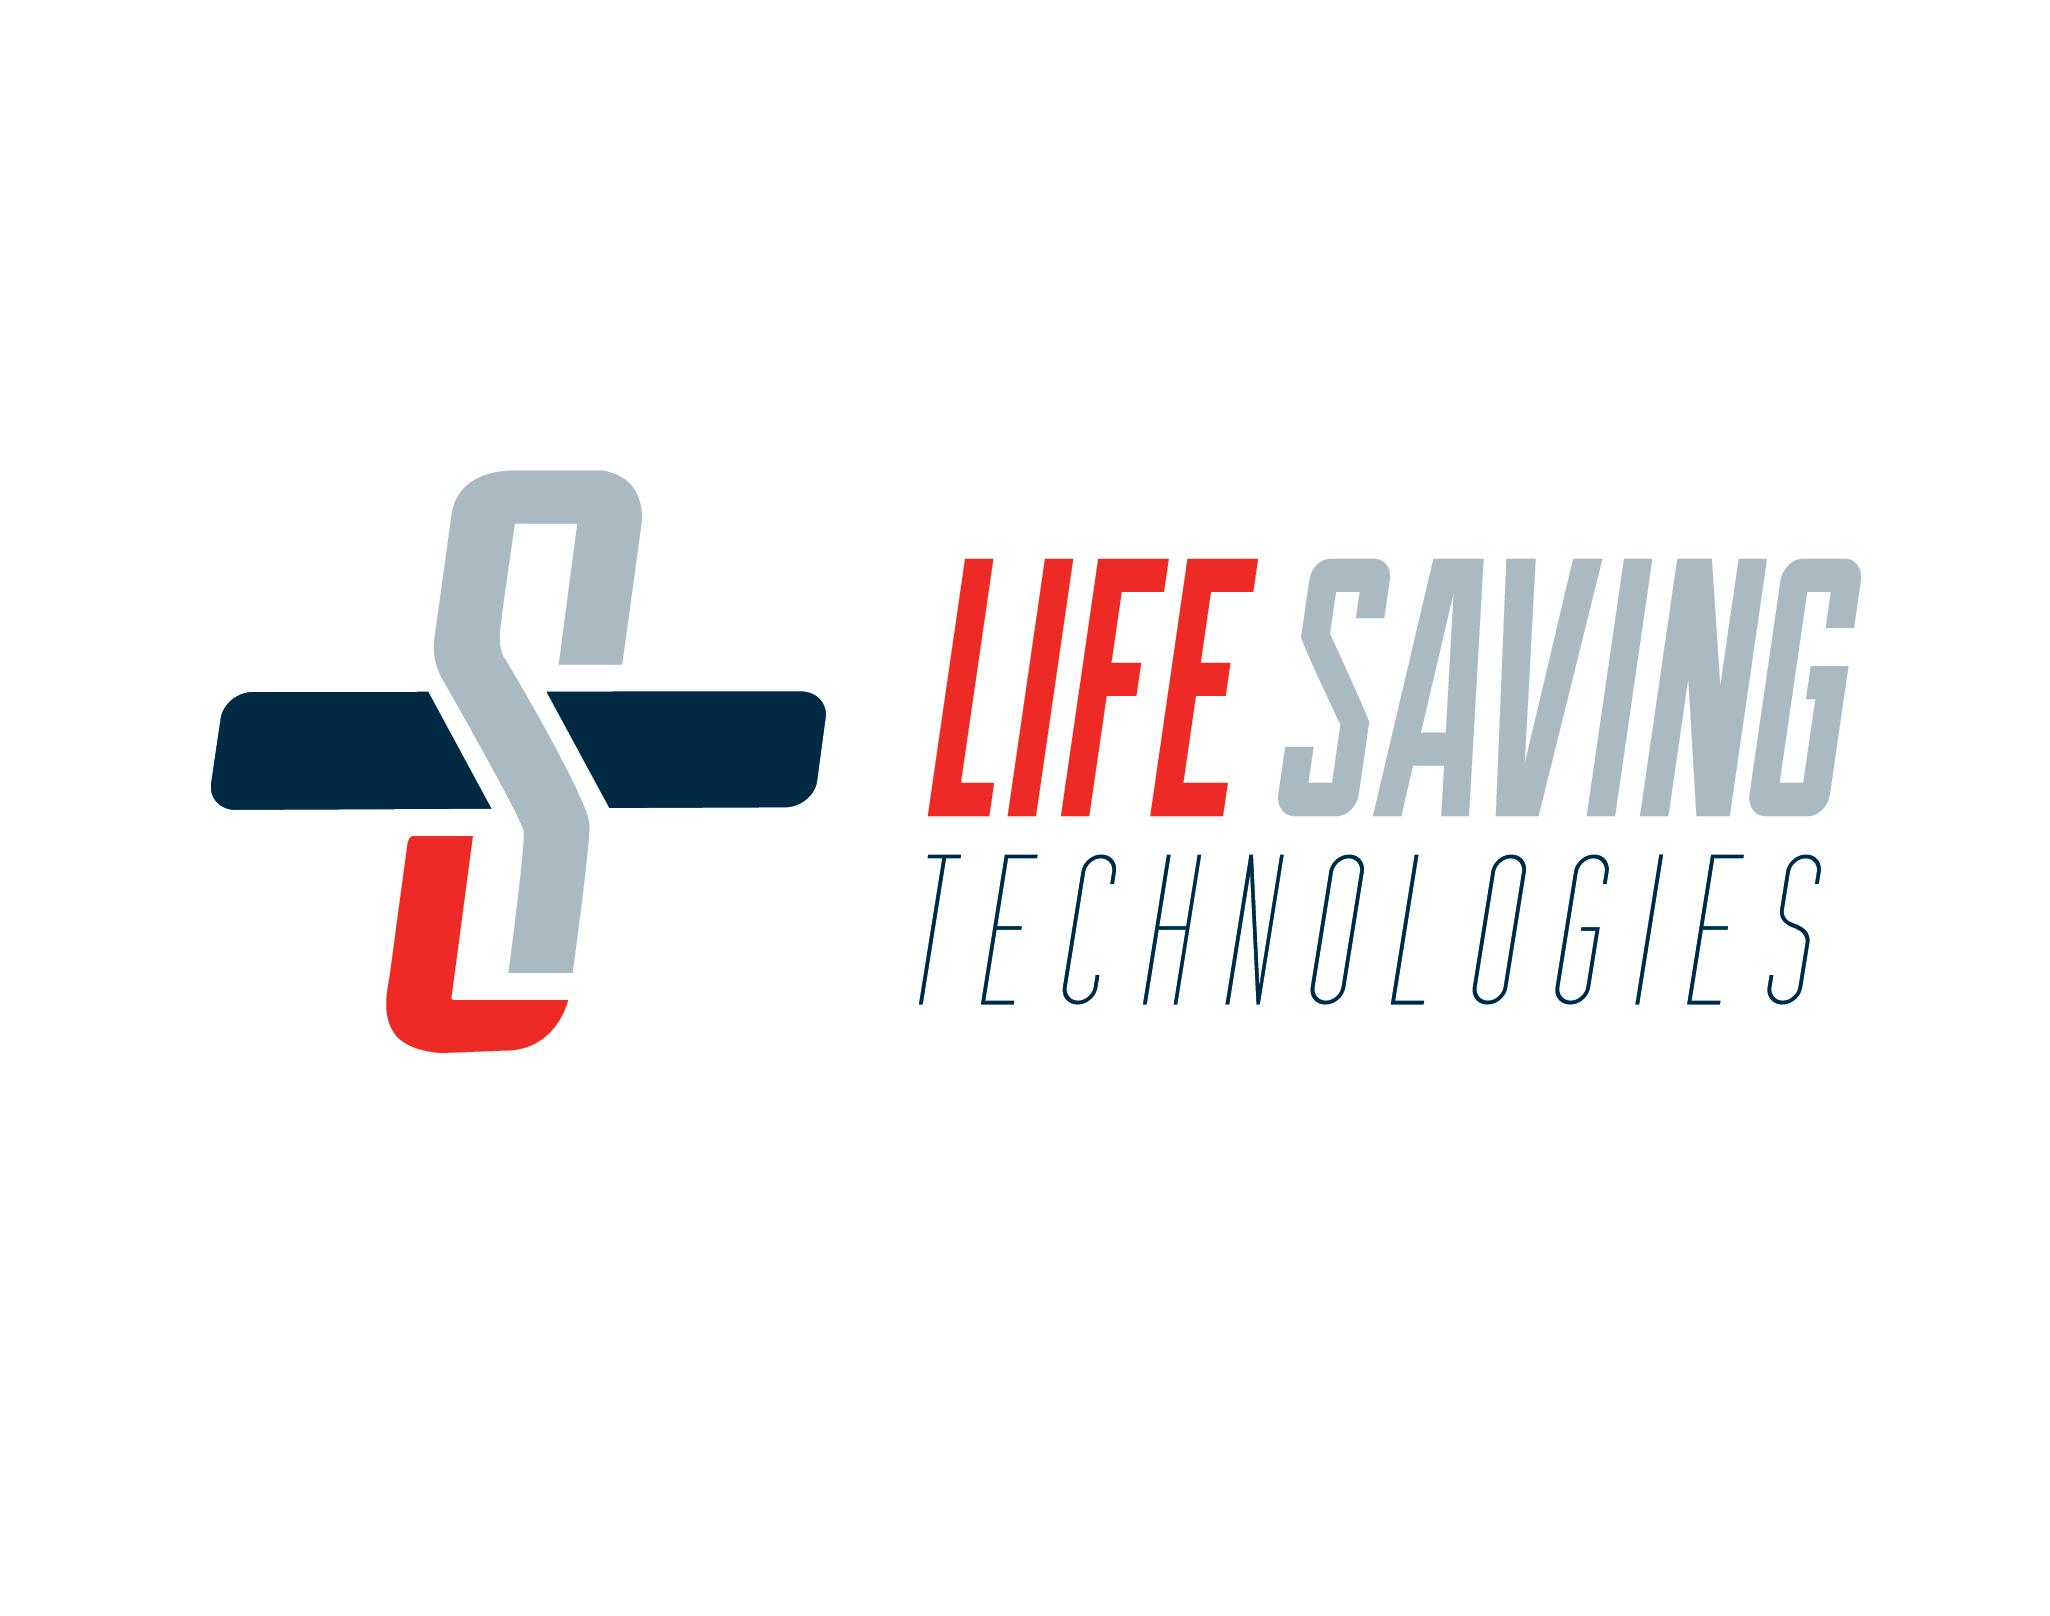 Life saving Technologies Logo